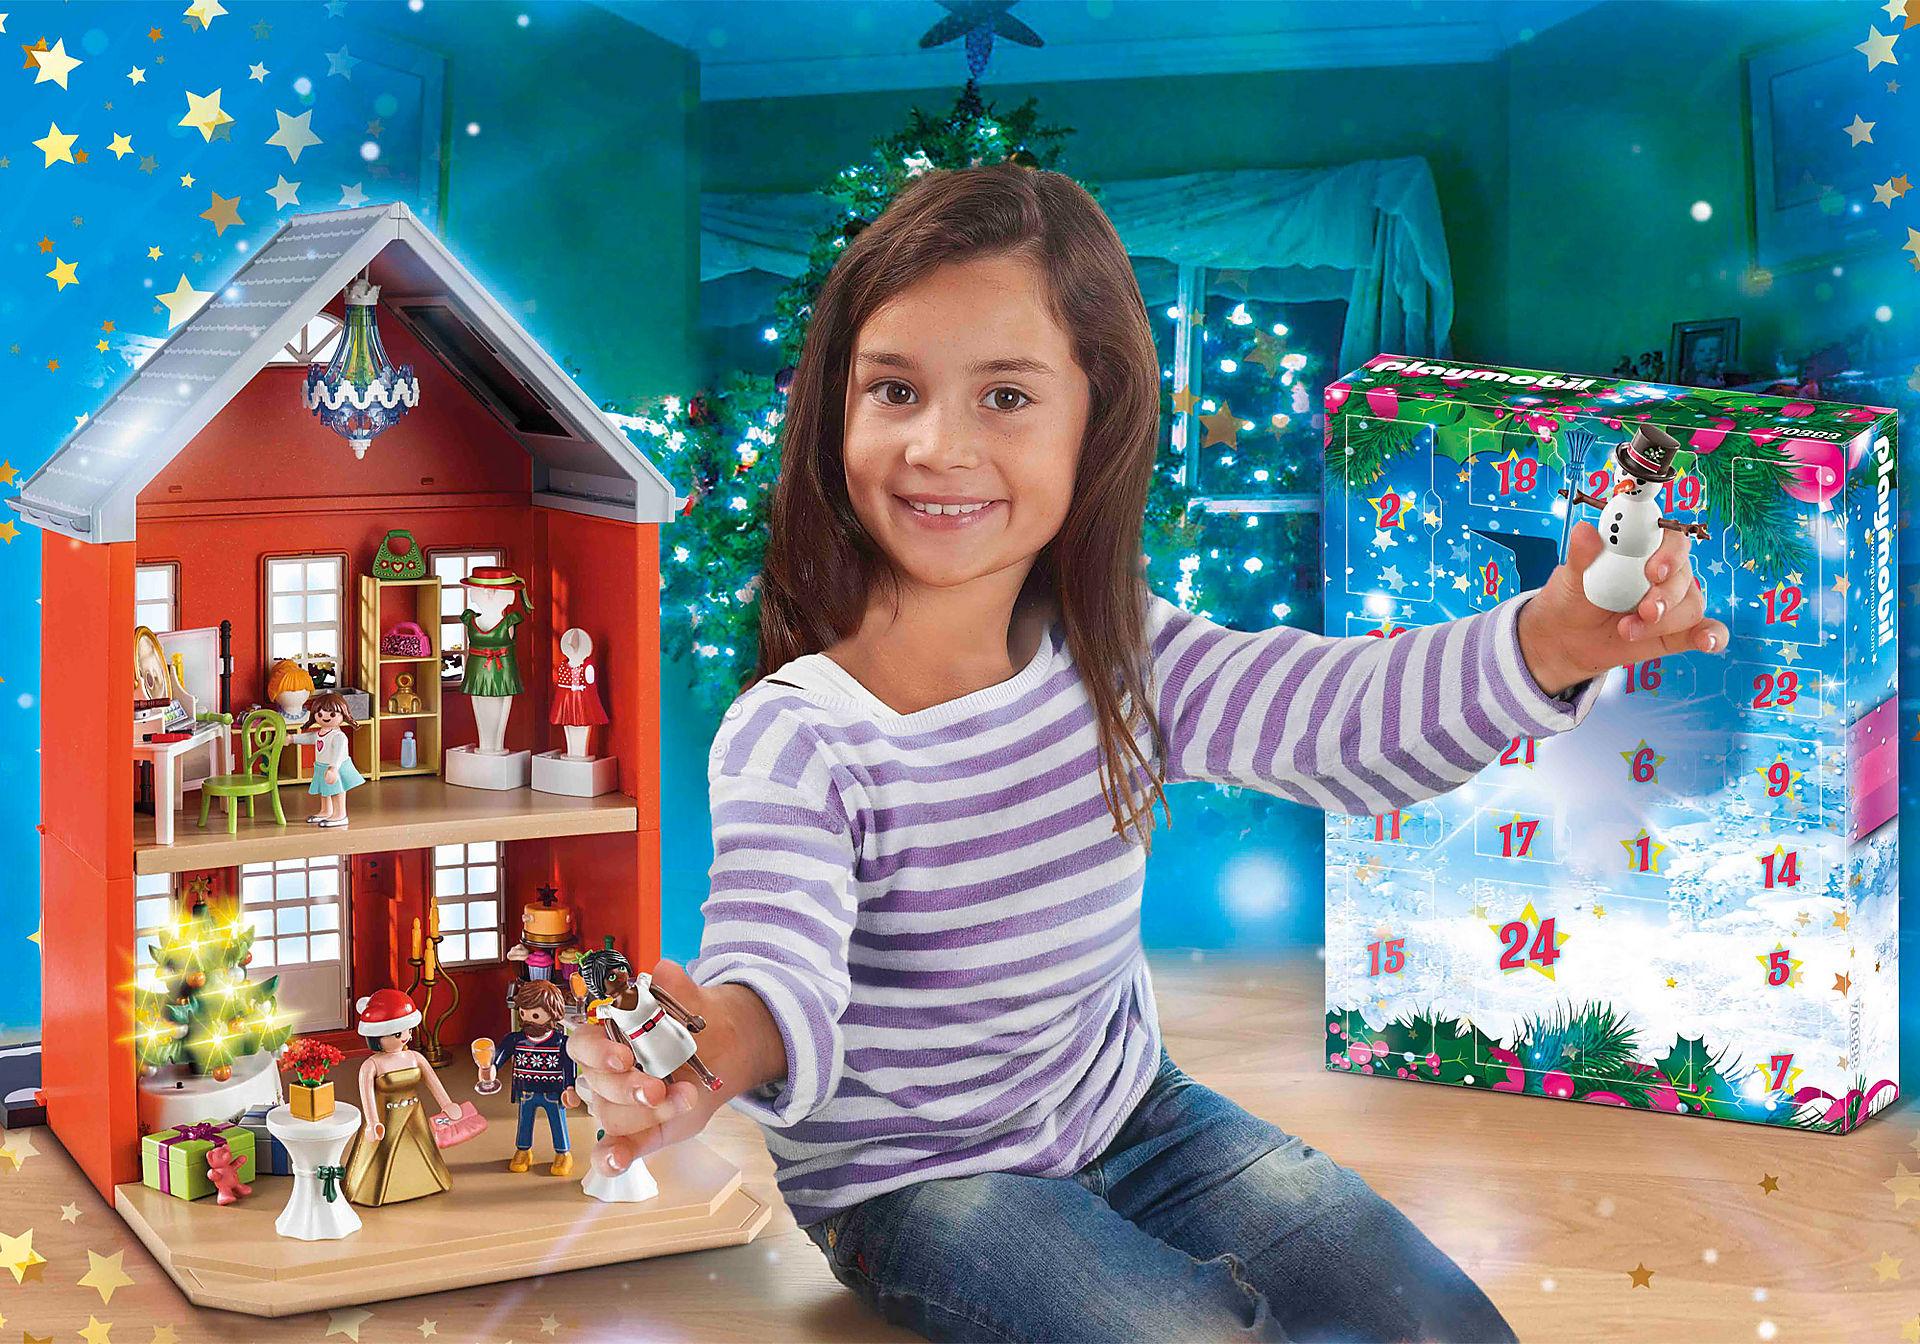 http://media.playmobil.com/i/playmobil/70383_product_detail/Adventskalender XL Kerst in huis